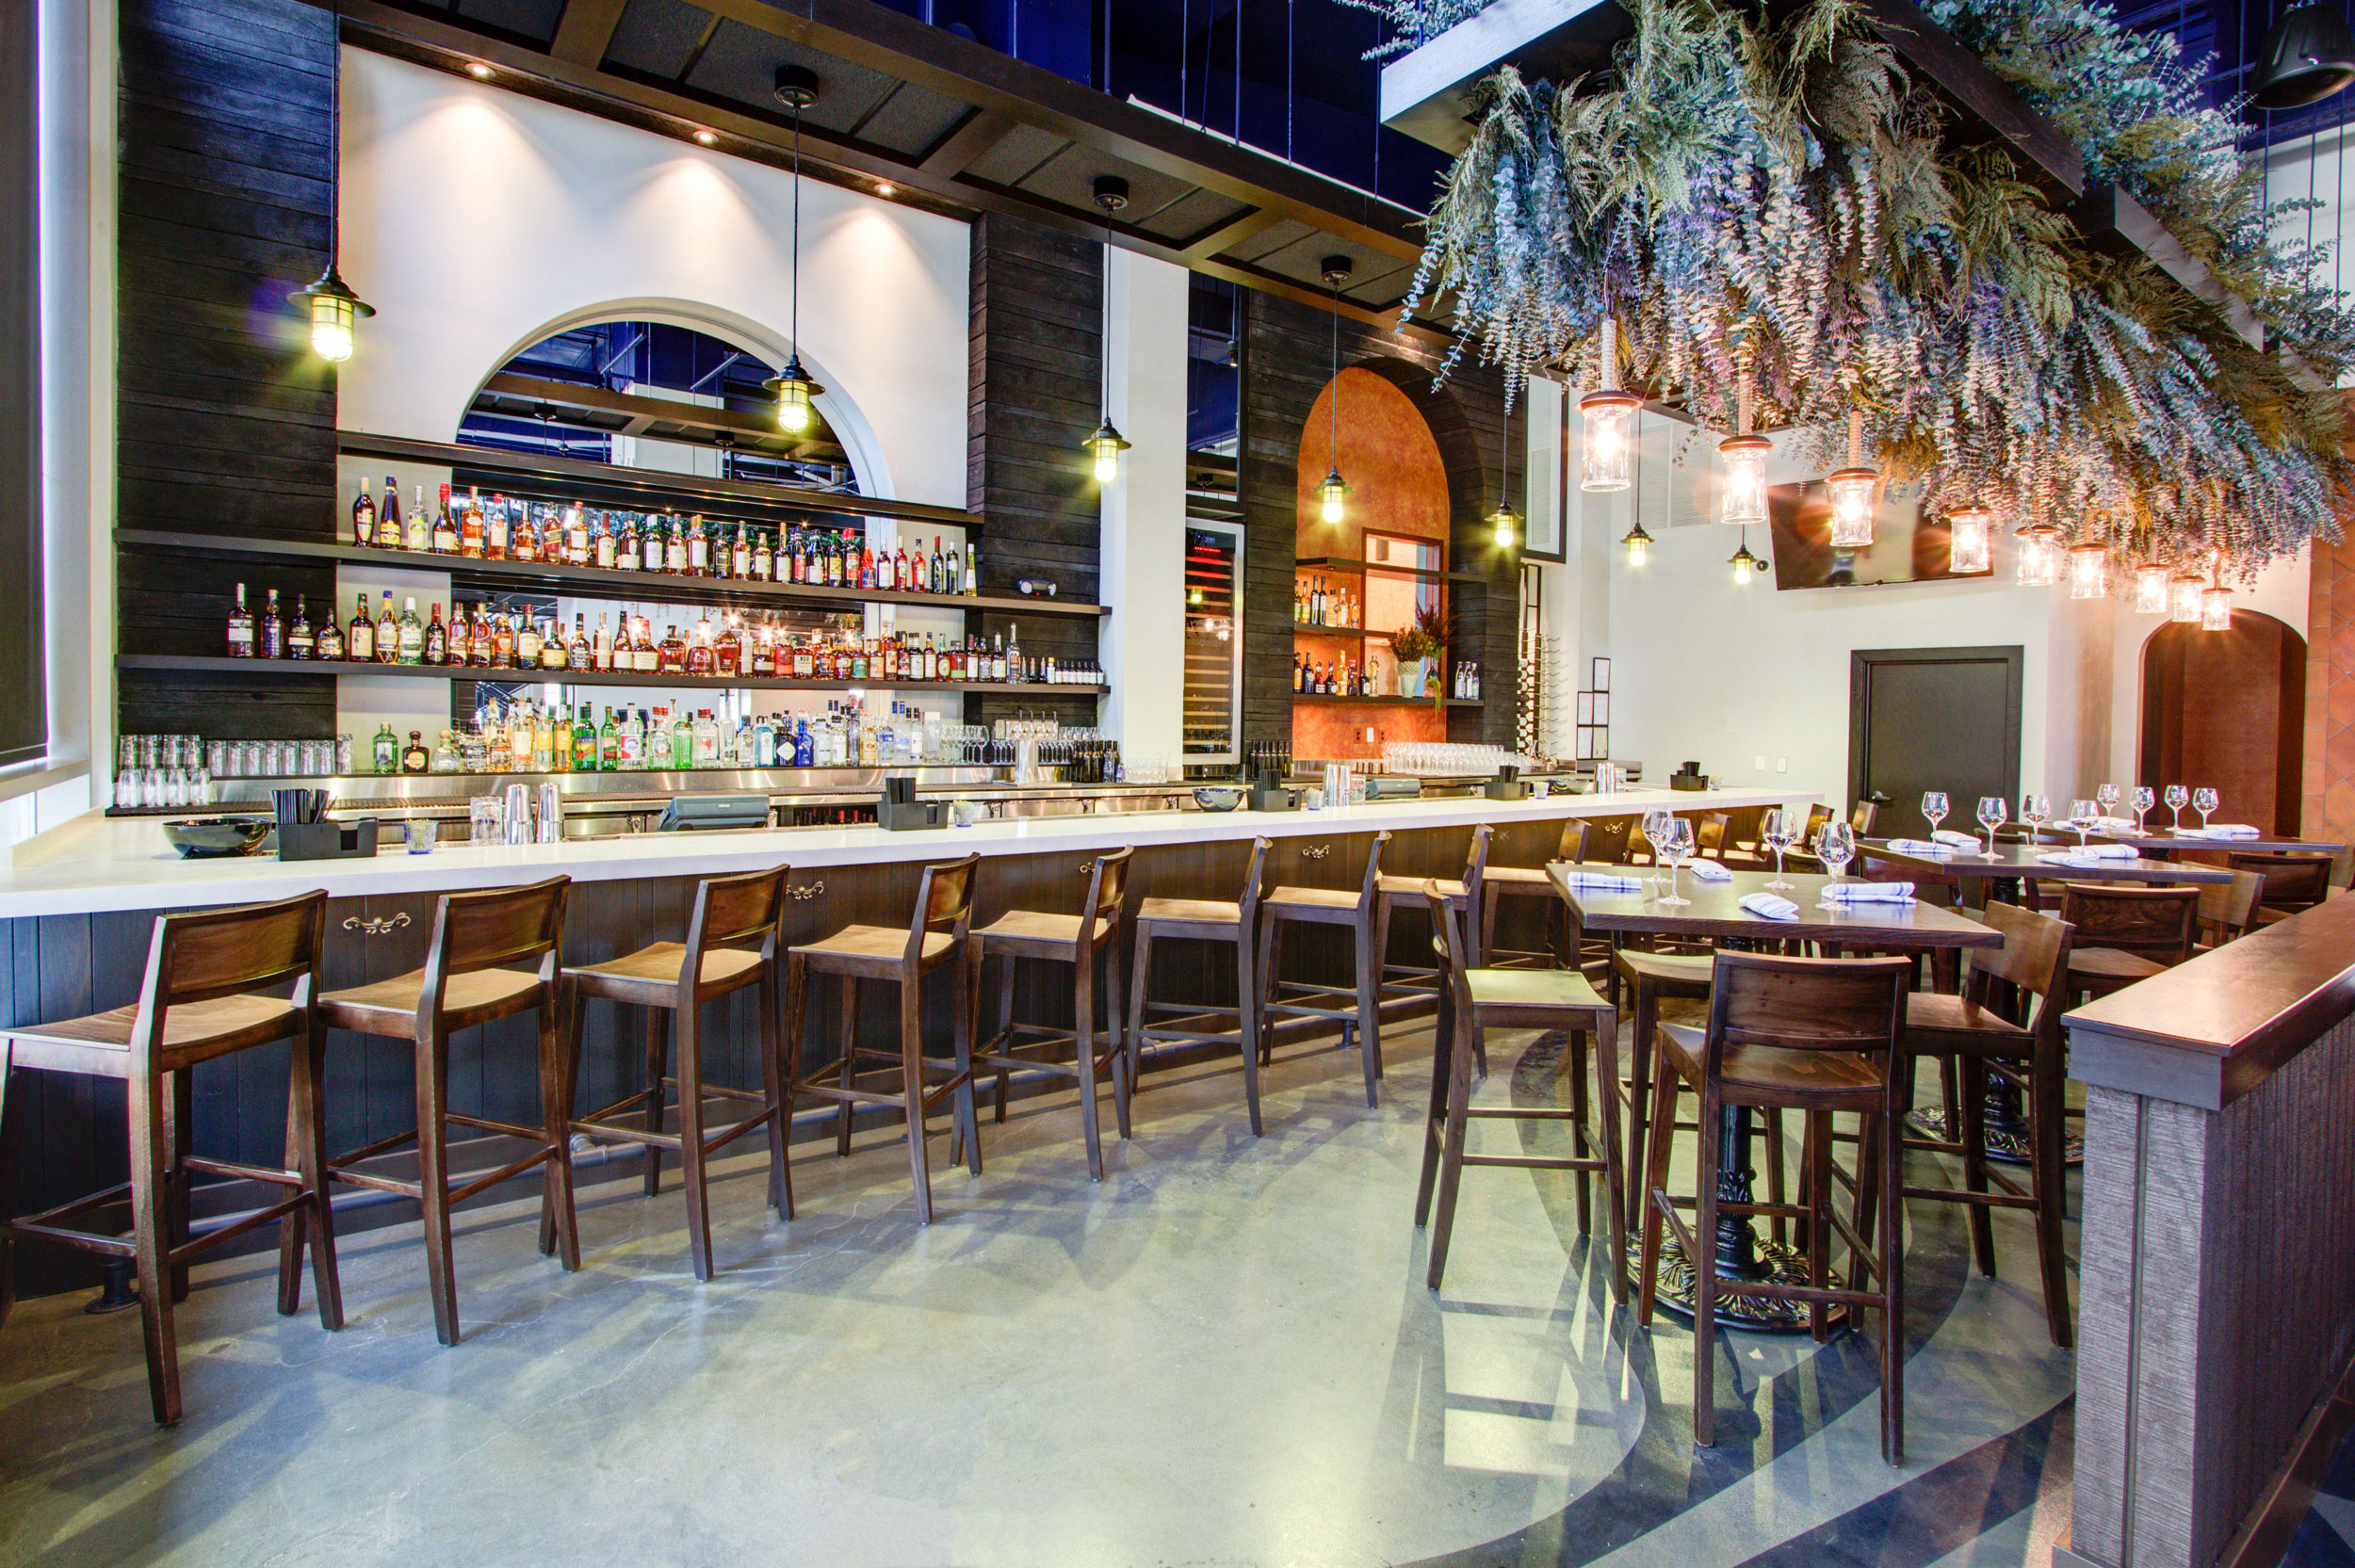 Kapnos Taverna Built by Hospitality Construction Services